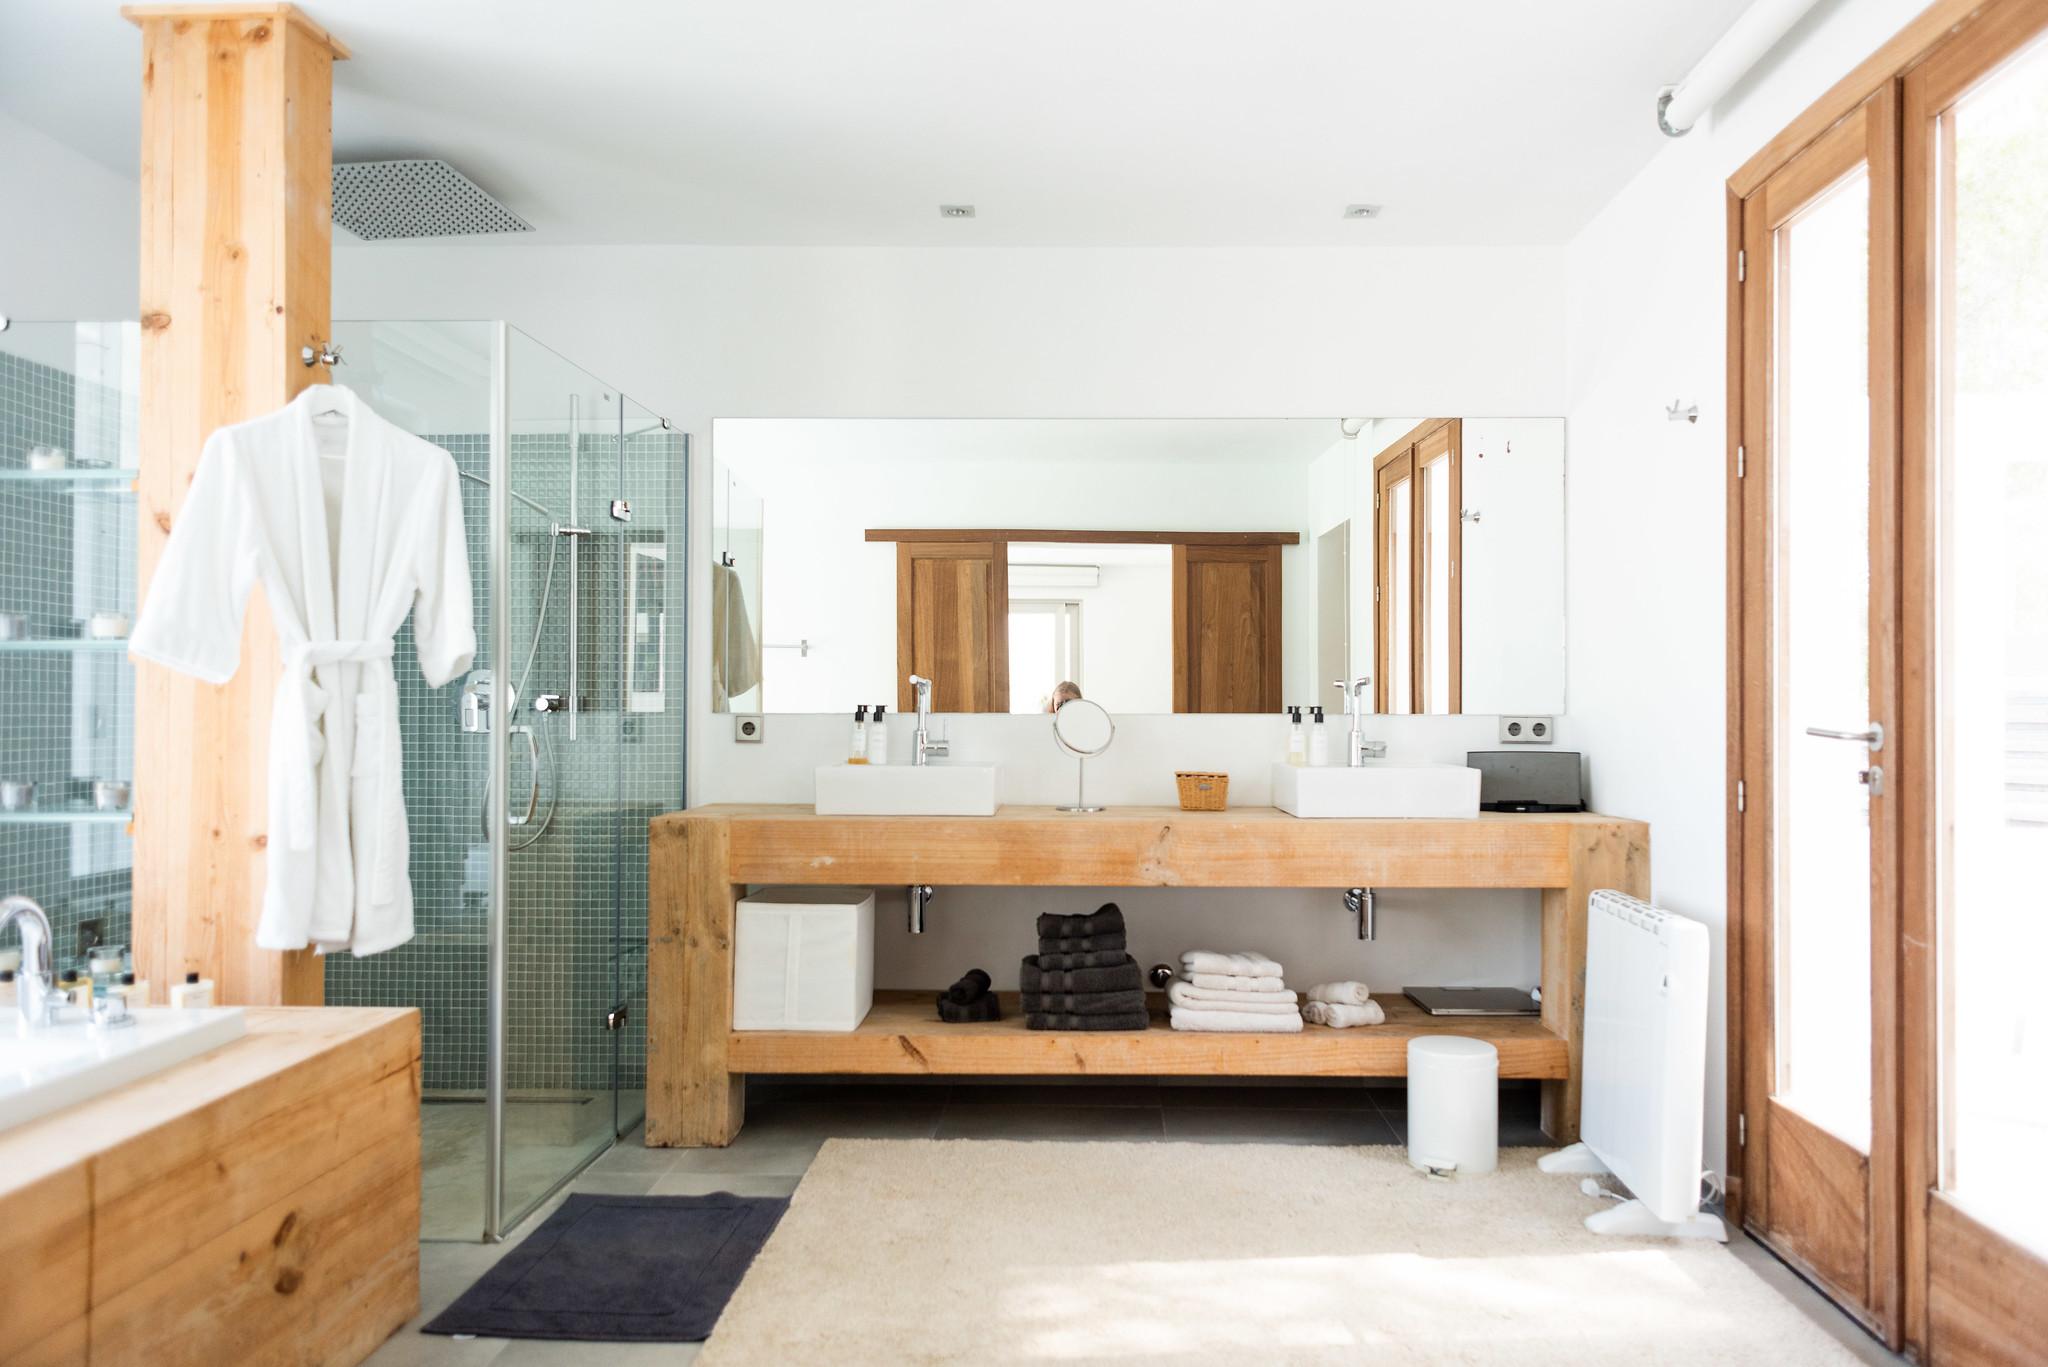 https://www.white-ibiza.com/wp-content/uploads/2020/05/white-ibiza-villas-can-dela-bathroom.jpg